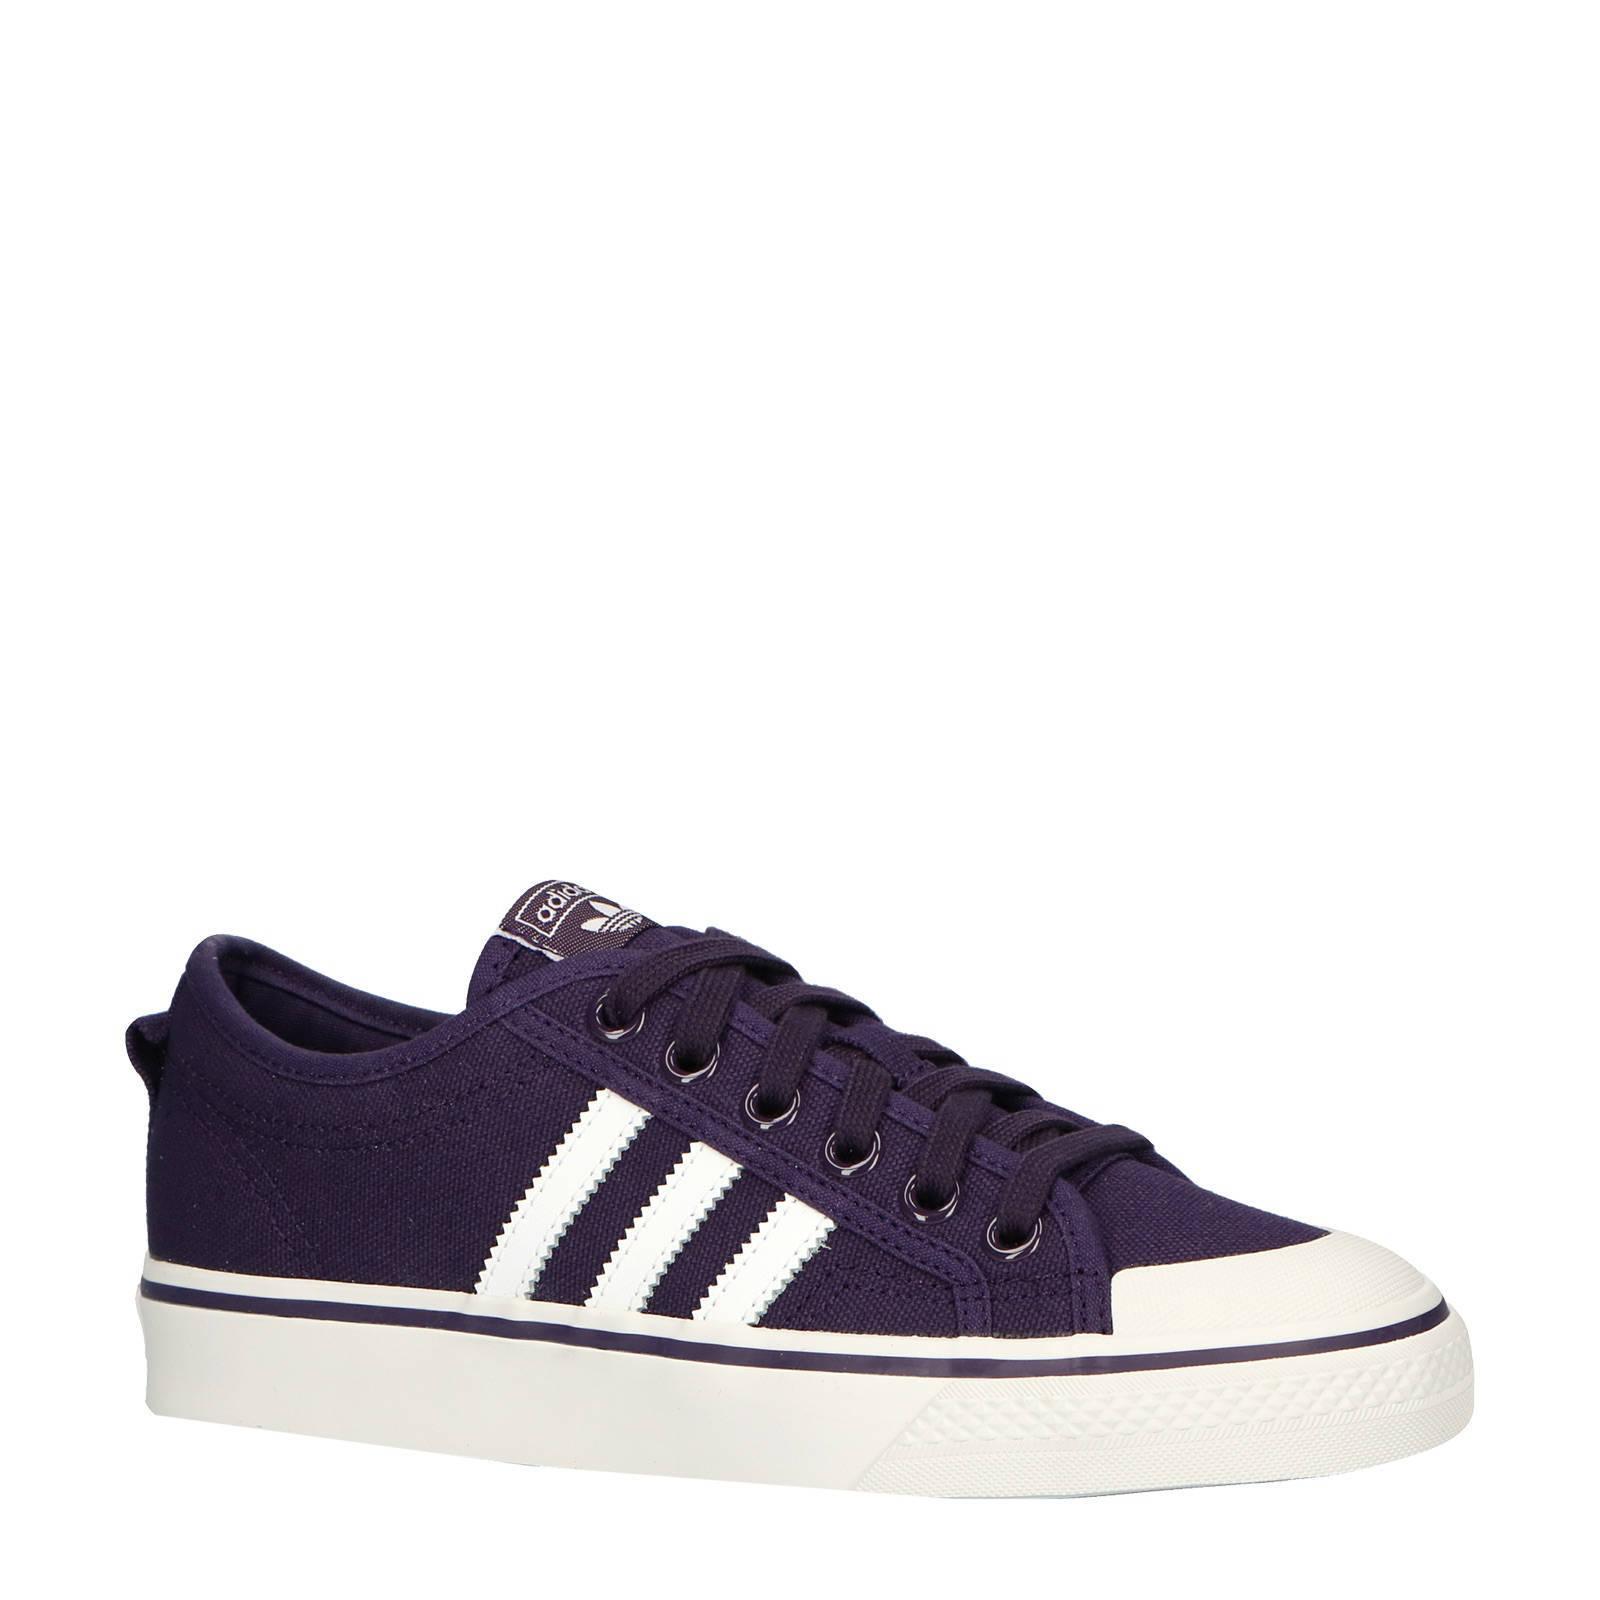 adidas originals Nizza W sneakers paars   wehkamp